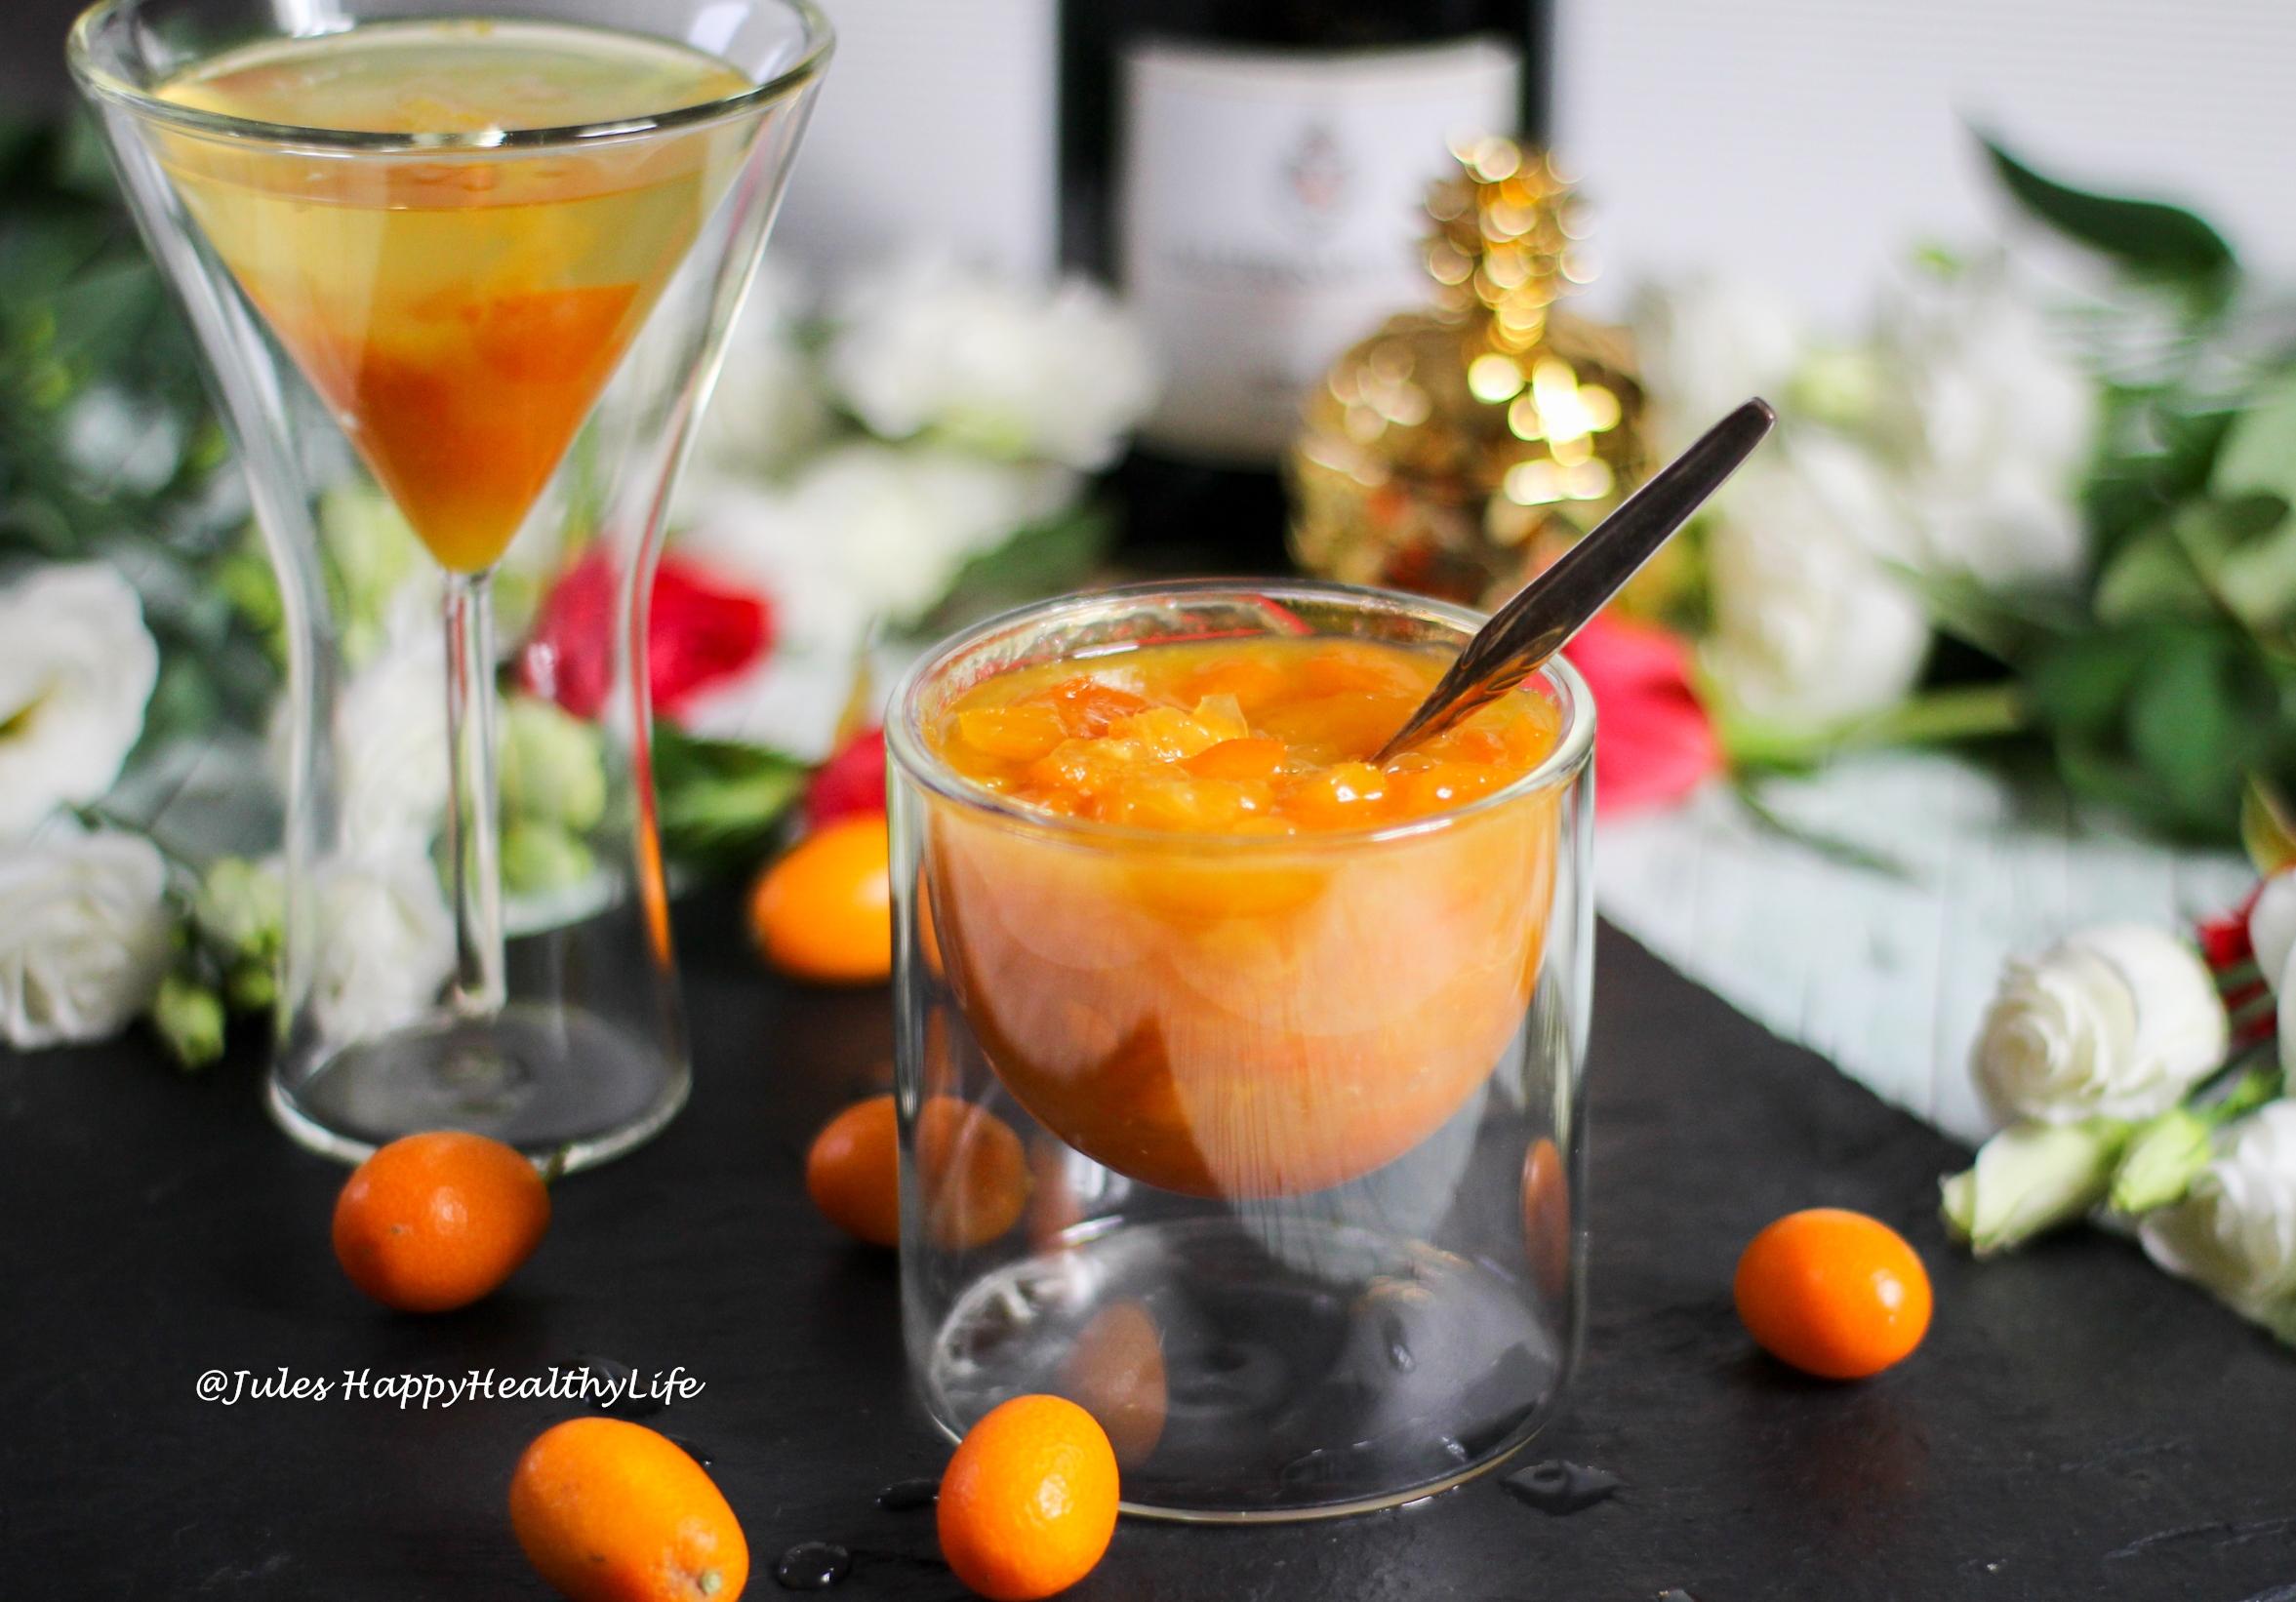 Spiced kumquats with cardamom, vanilla and star anise